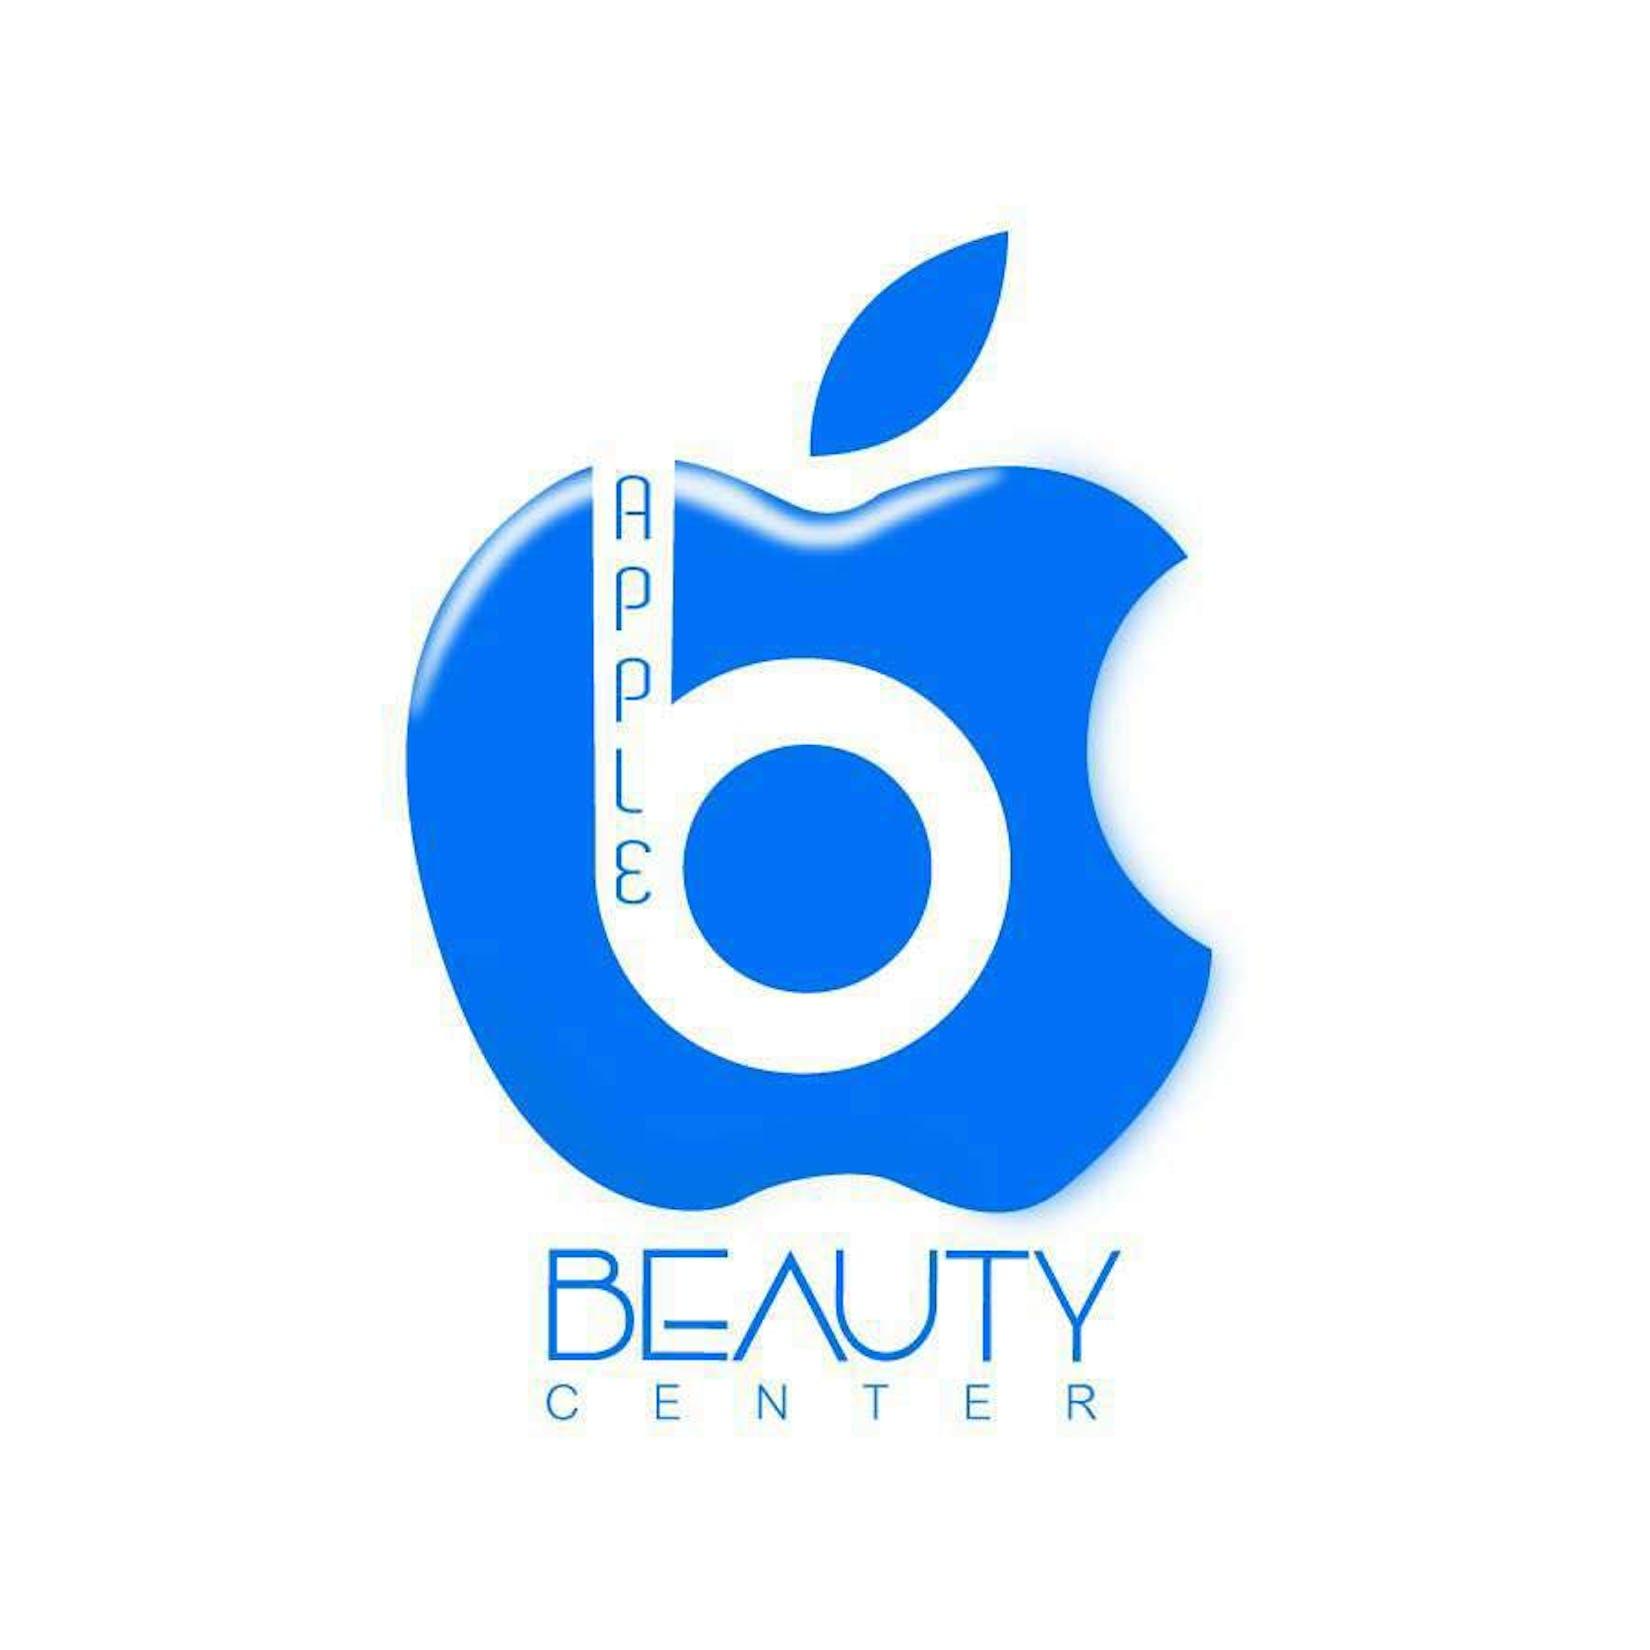 Apple Beauty Center & Aesthetic Clinic | Beauty